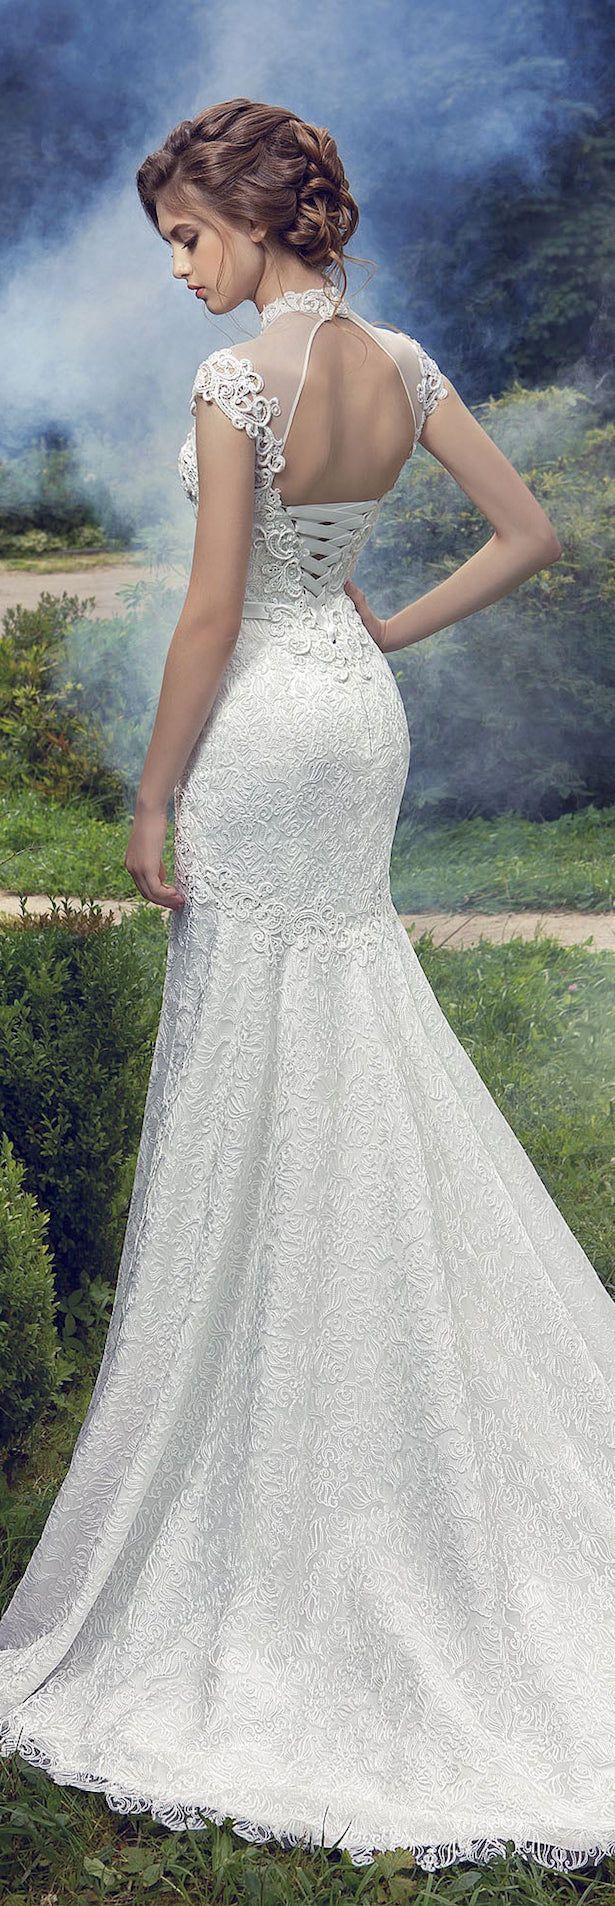 Best 25 fairy wedding dress ideas on pinterest woodland wedding milva 2016 wedding dresses fairy gardens collection junglespirit Image collections